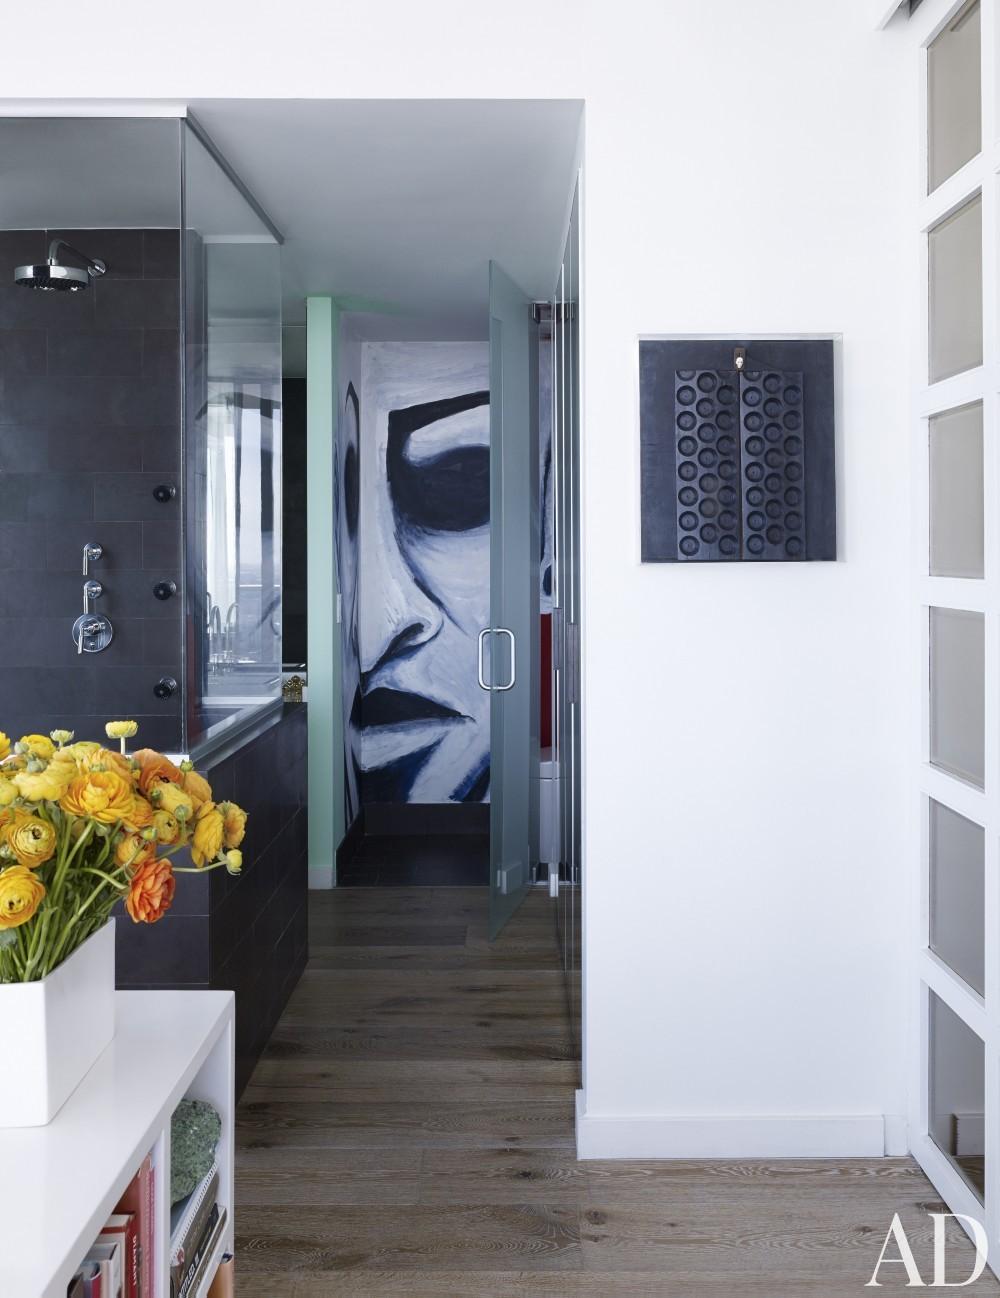 Bathroom and Chad Oppenheim in Miami, FL